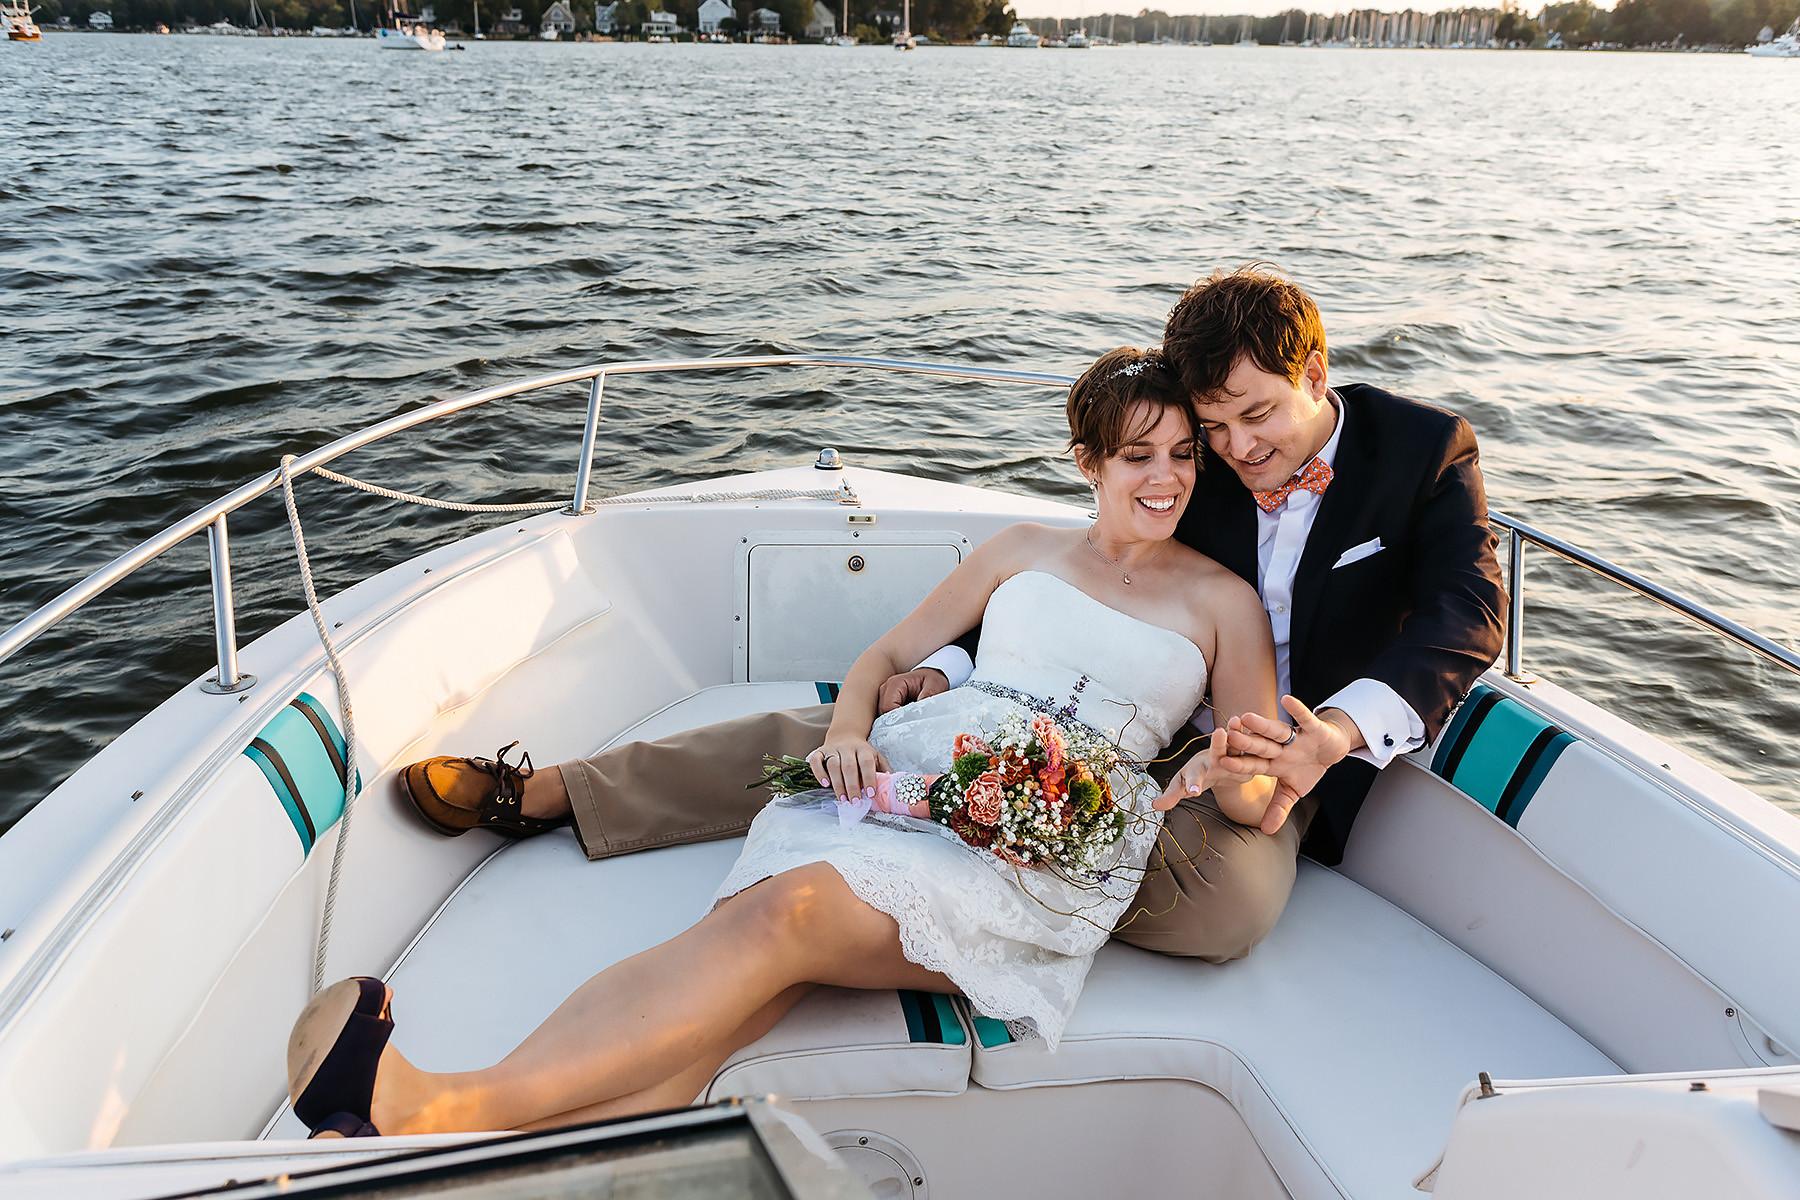 Wedding Day Boating